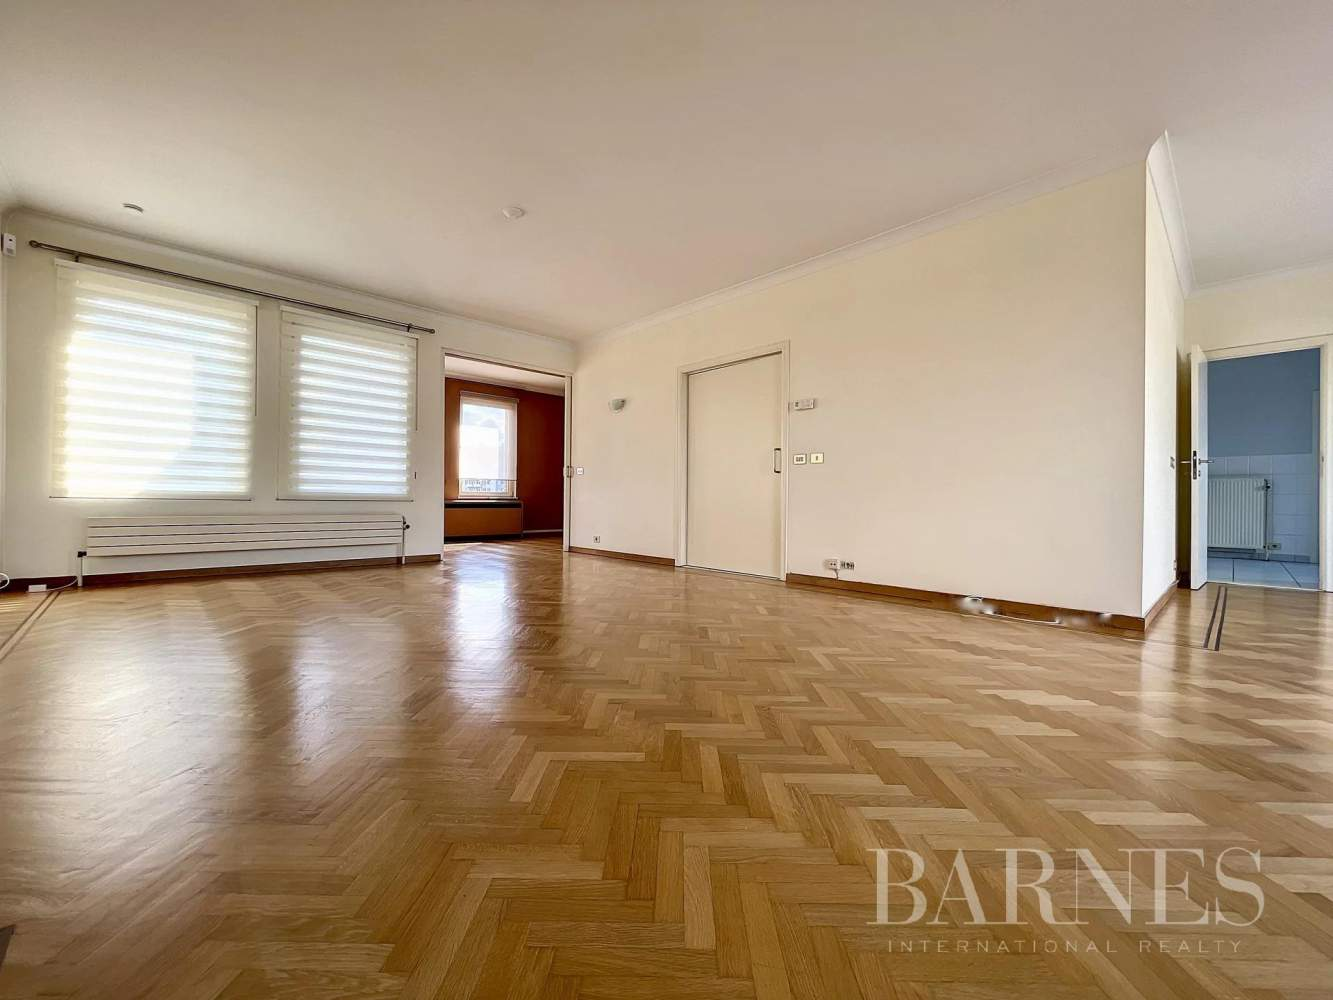 Woluwe-Saint-Lambert  - Appartement 6 Pièces 2 Chambres - picture 3